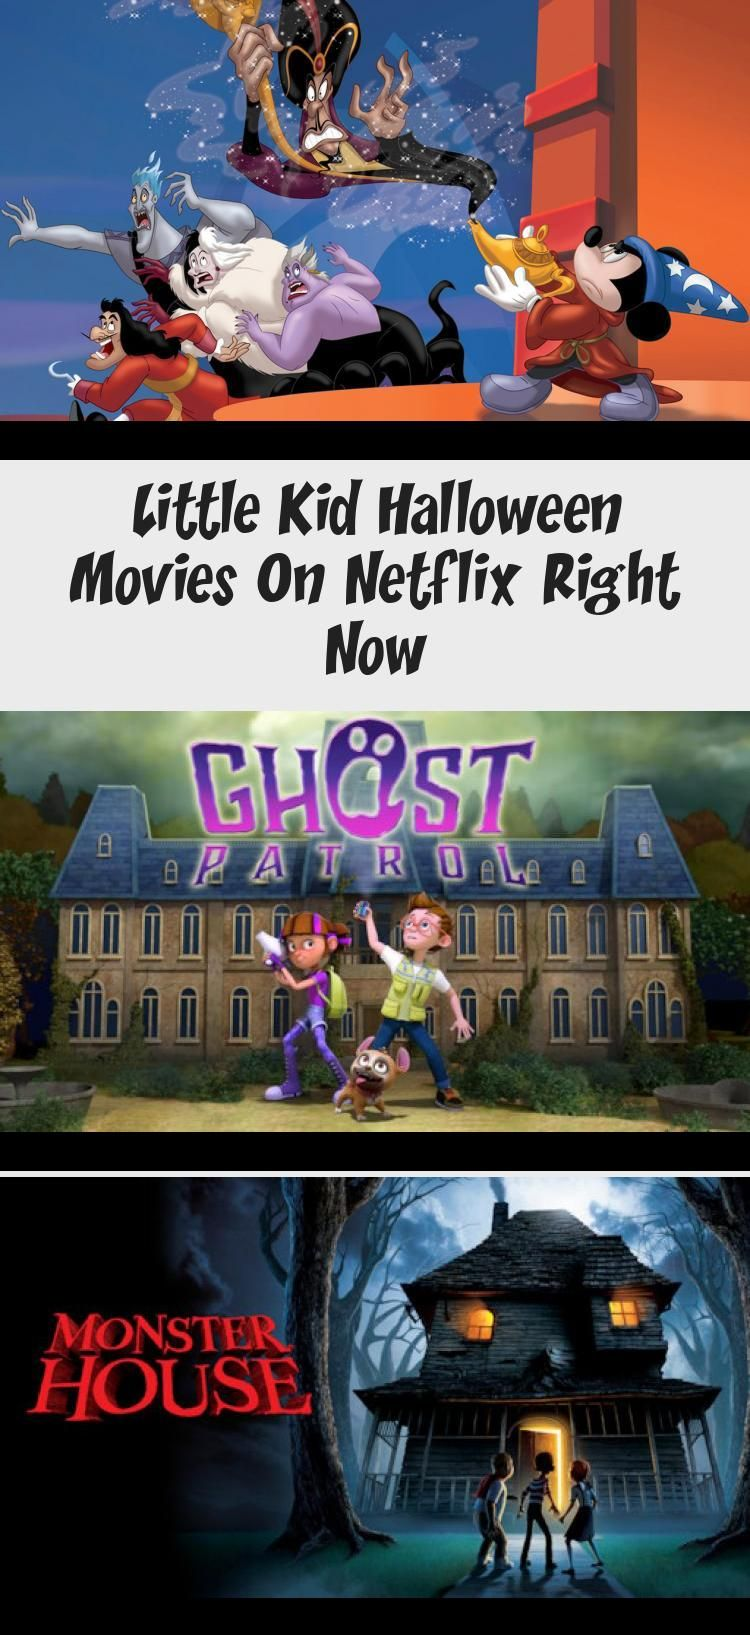 Little Kid Halloween Movies On Netflix Right Now in 2020